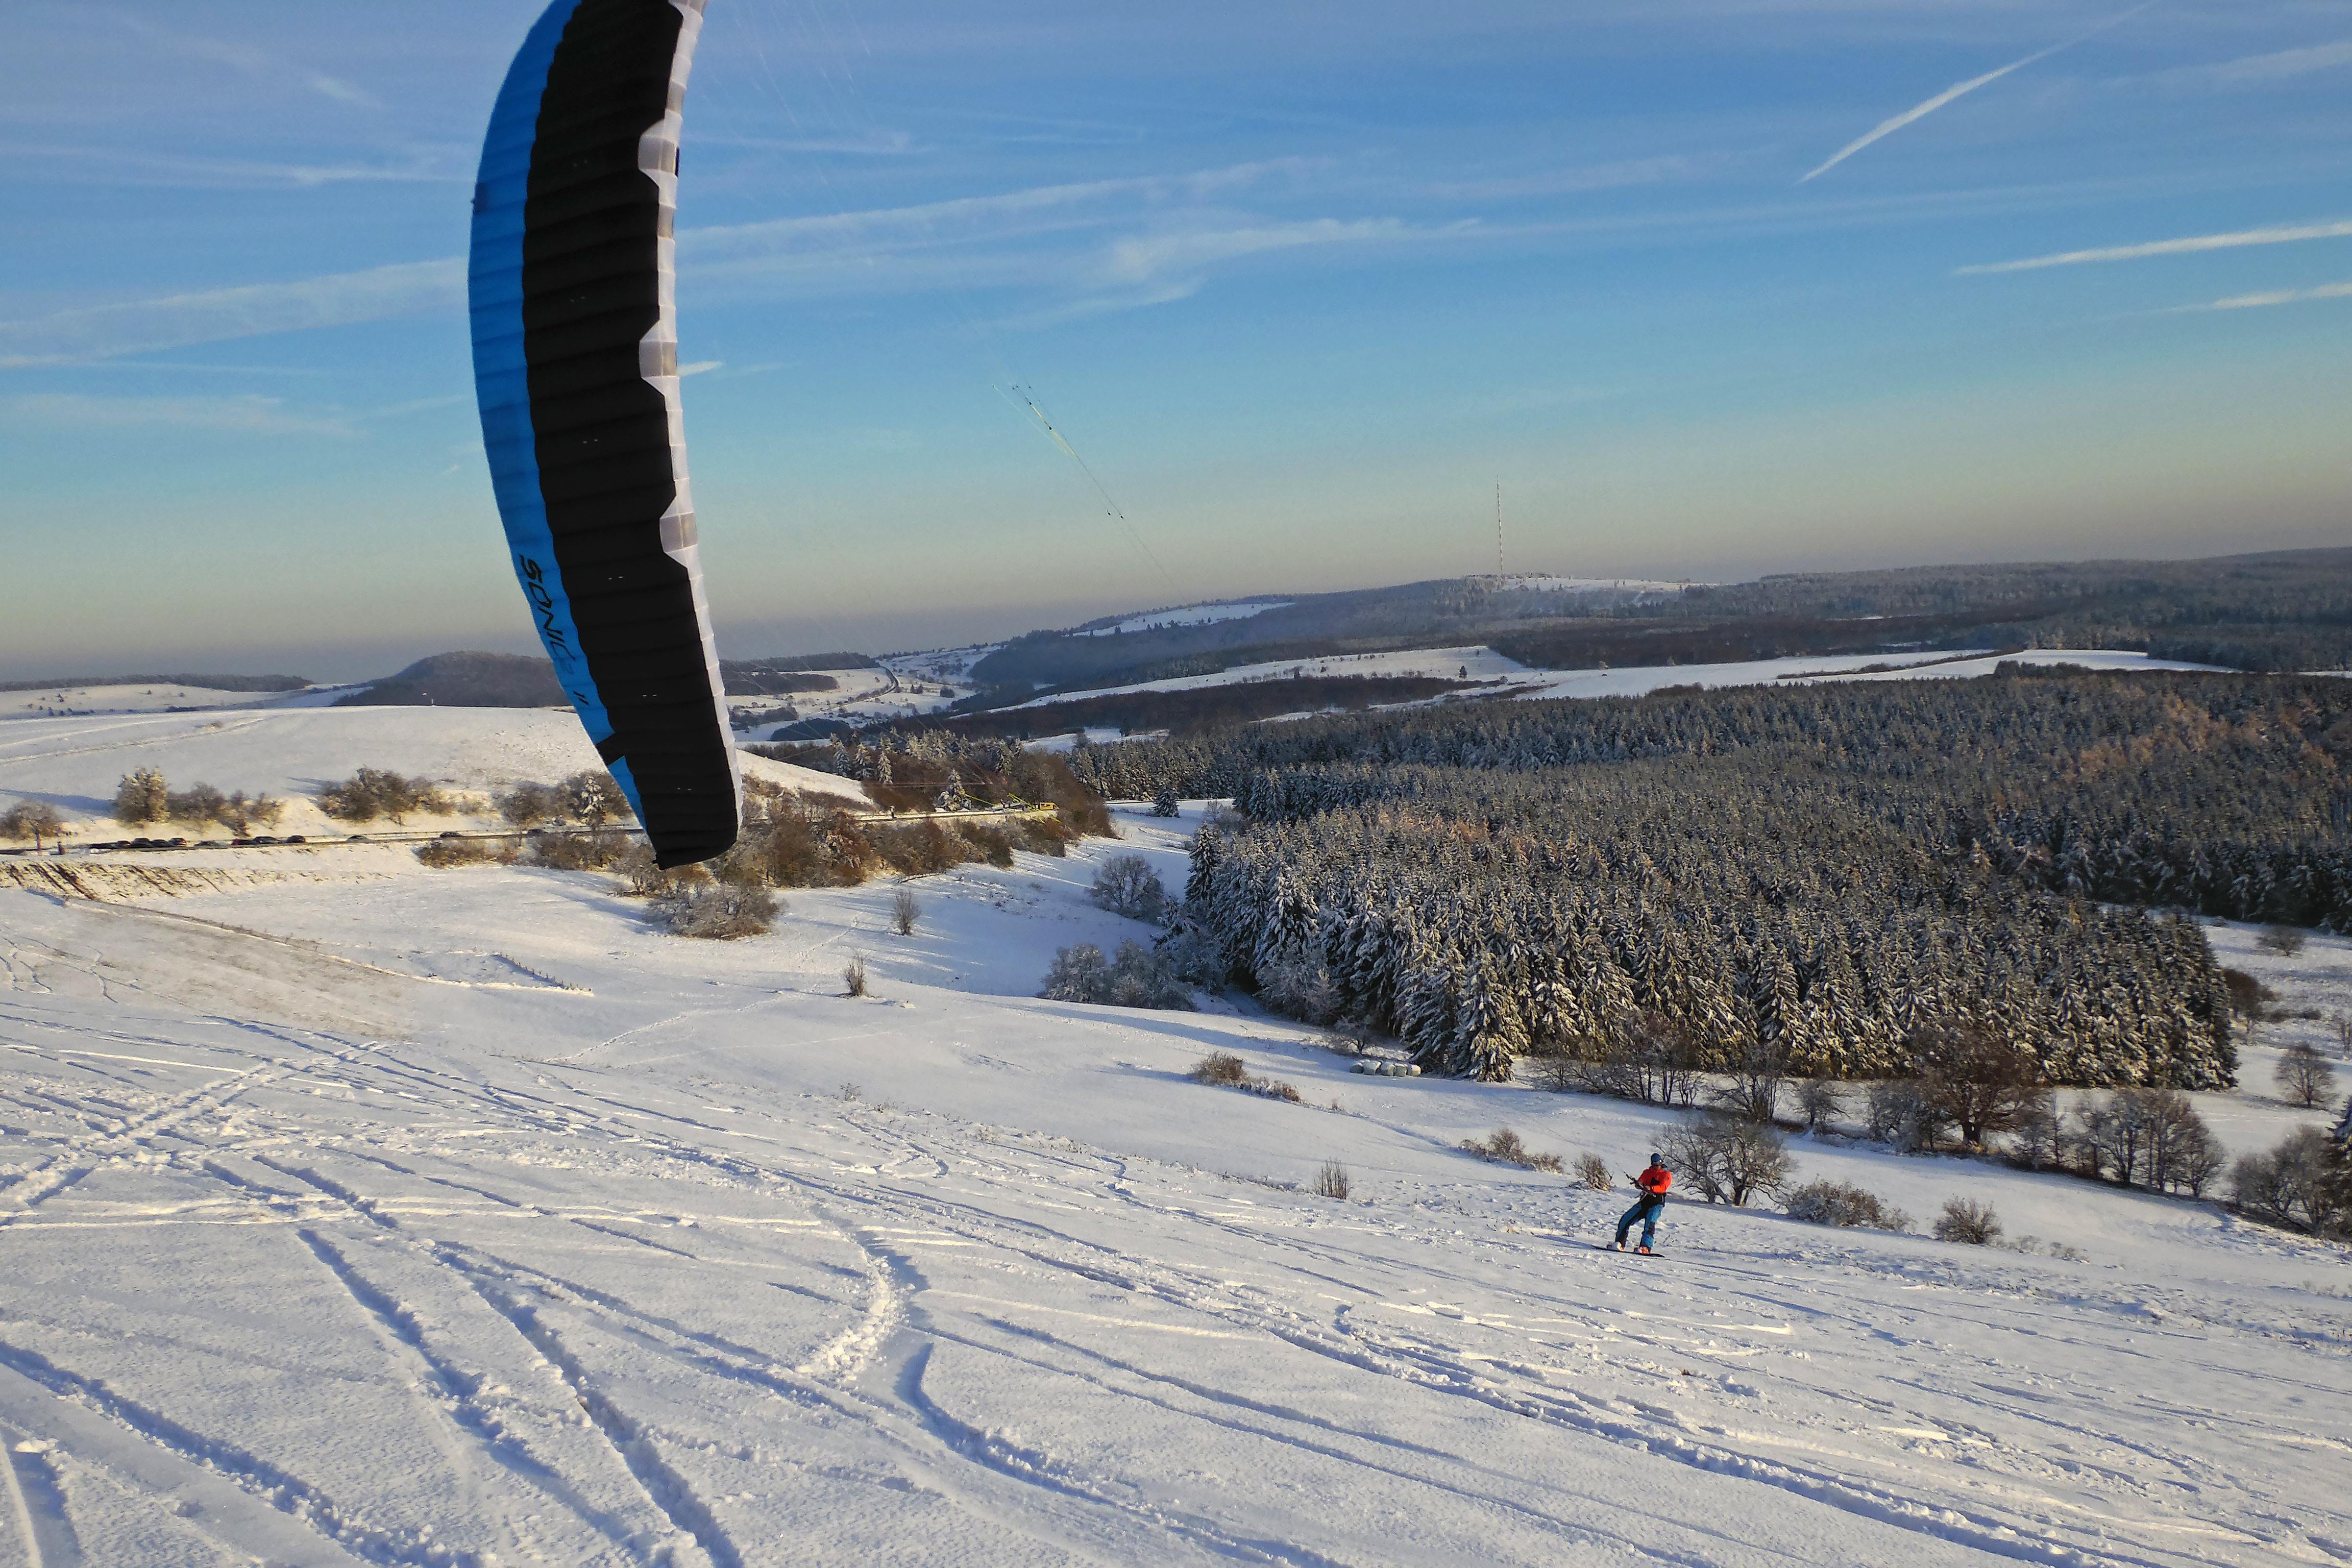 wasserkuppe-snowkite kitefeel